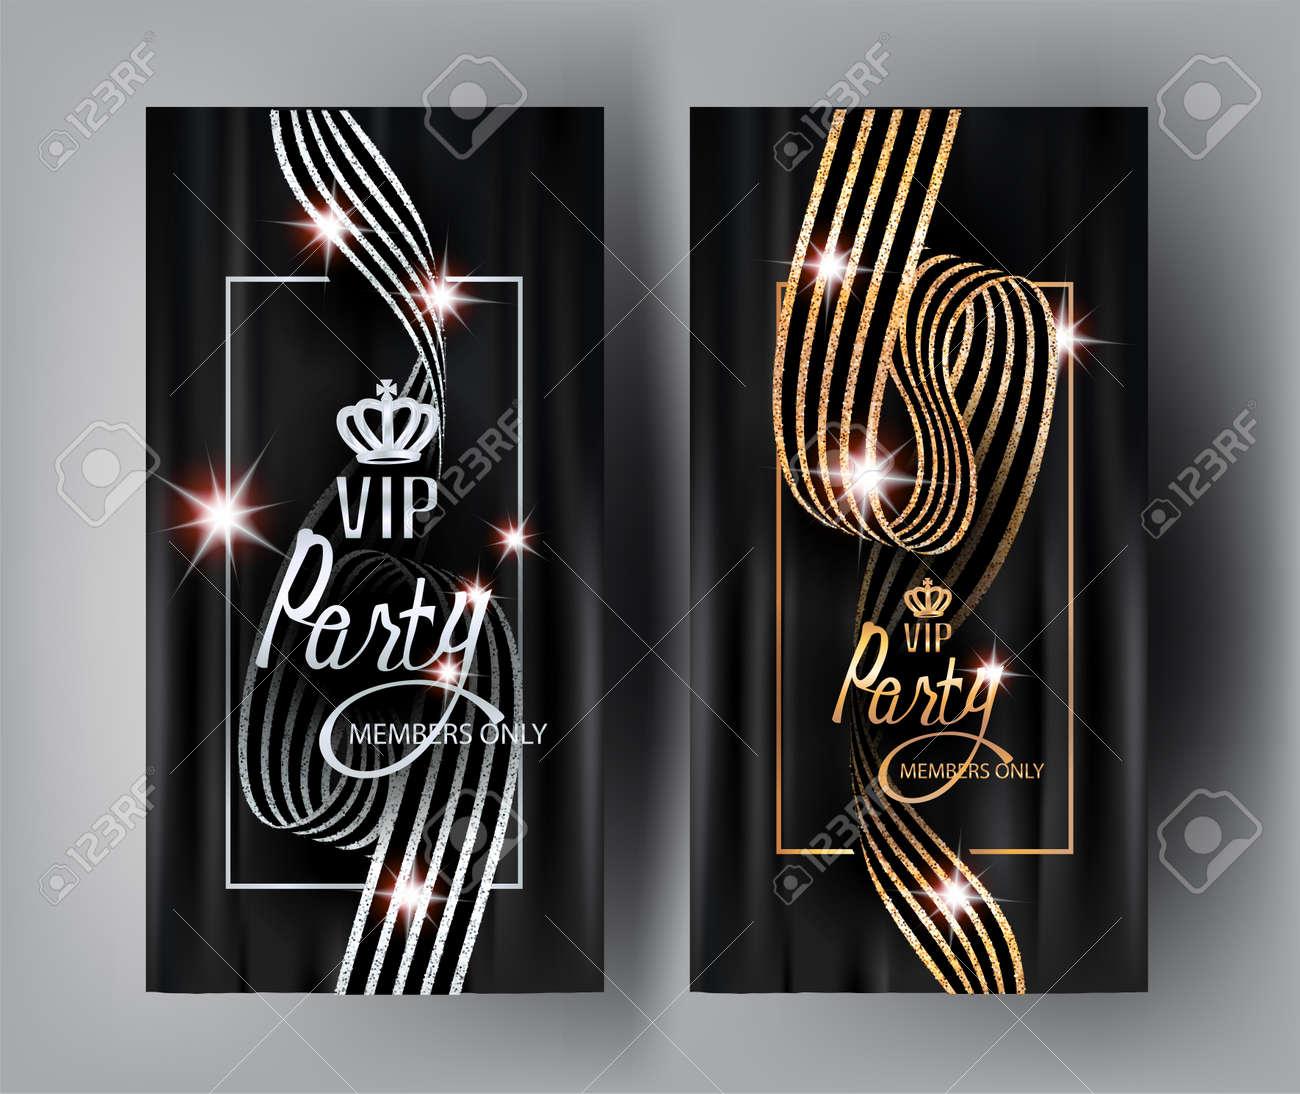 Vip elegant invitation cards with striped curly ribbons vector vector vip elegant invitation cards with striped curly ribbons vector illustration stopboris Choice Image